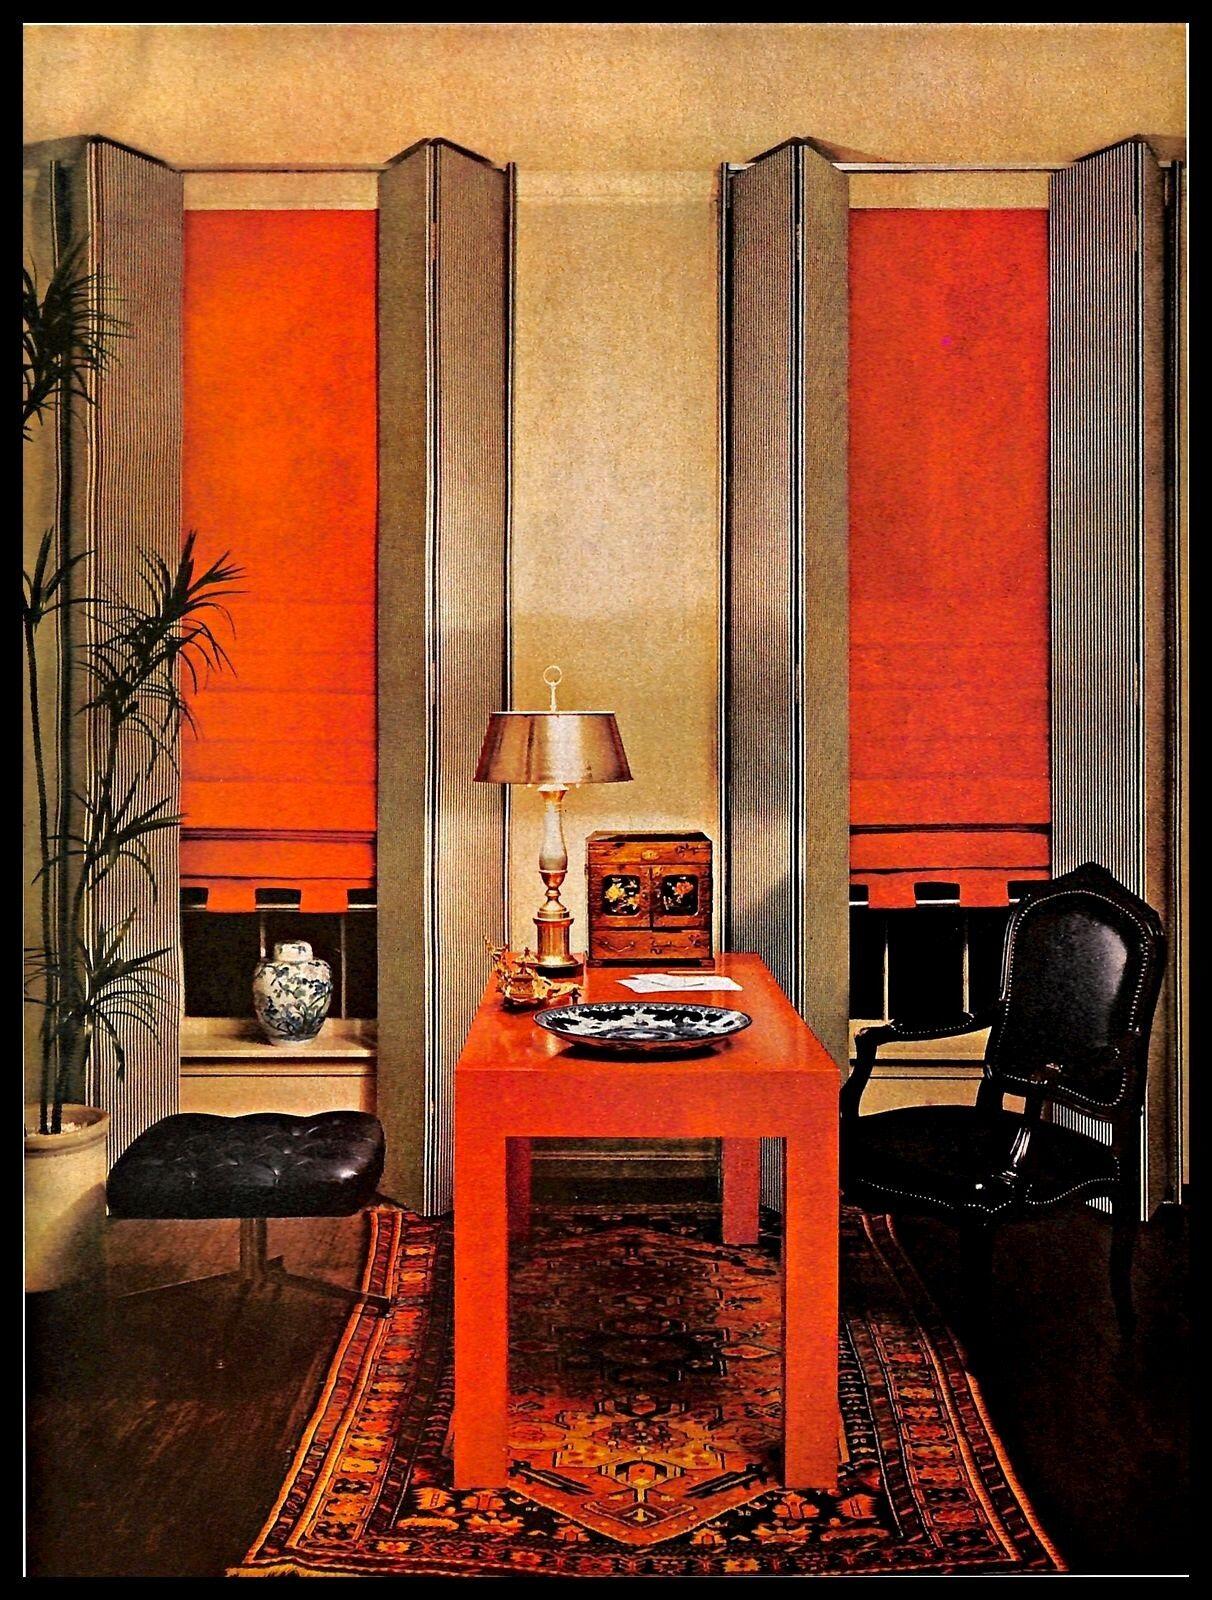 1966 Private Office Interior Home Decor Vintage Magazine PRINT IMAGE 1960s